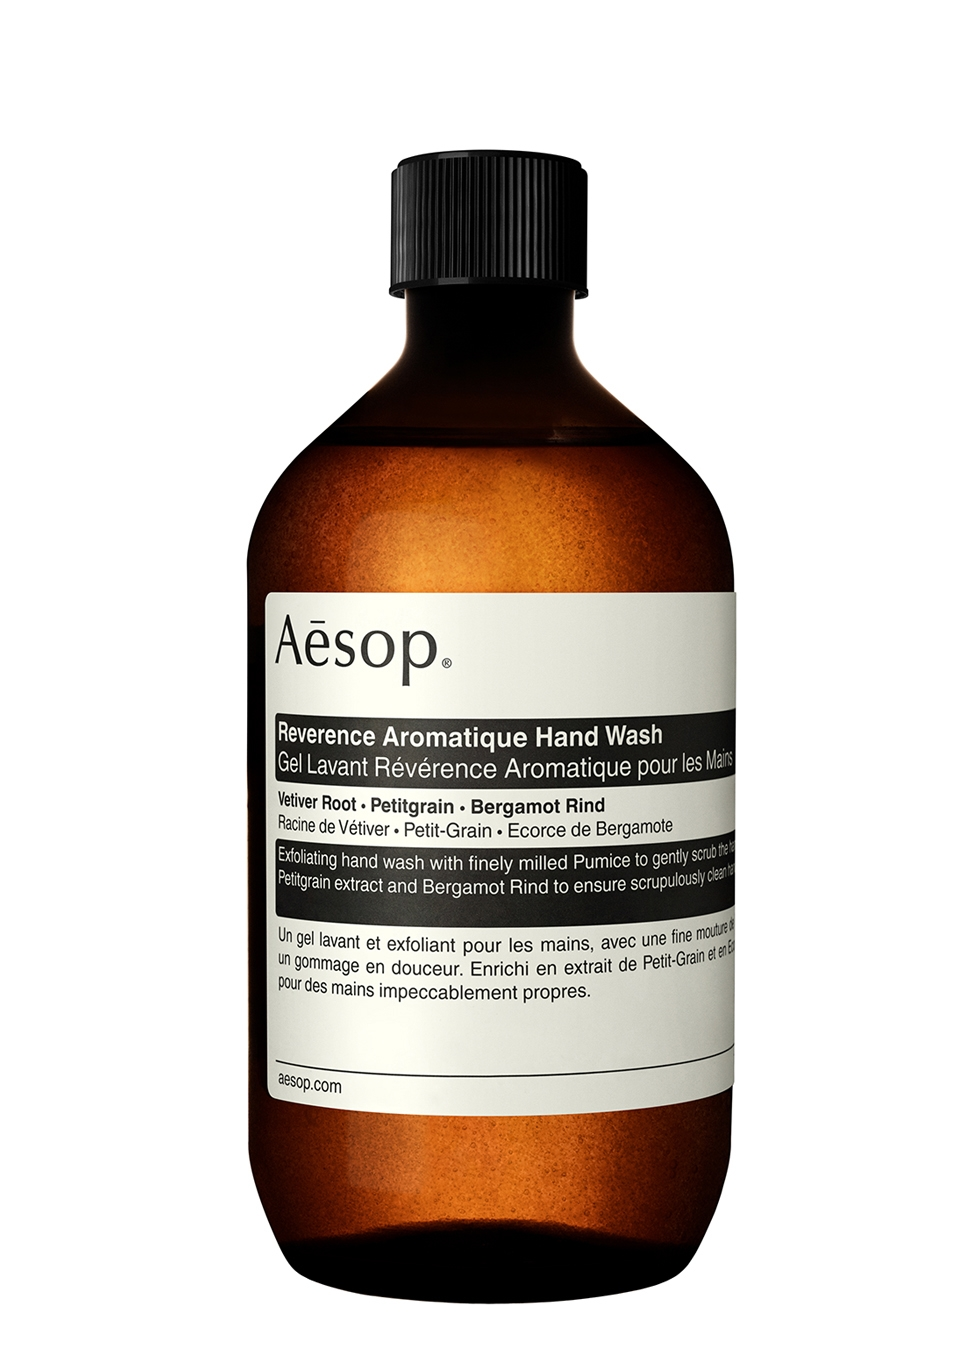 Reverence Aromatique Hand Wash Refill 500ml